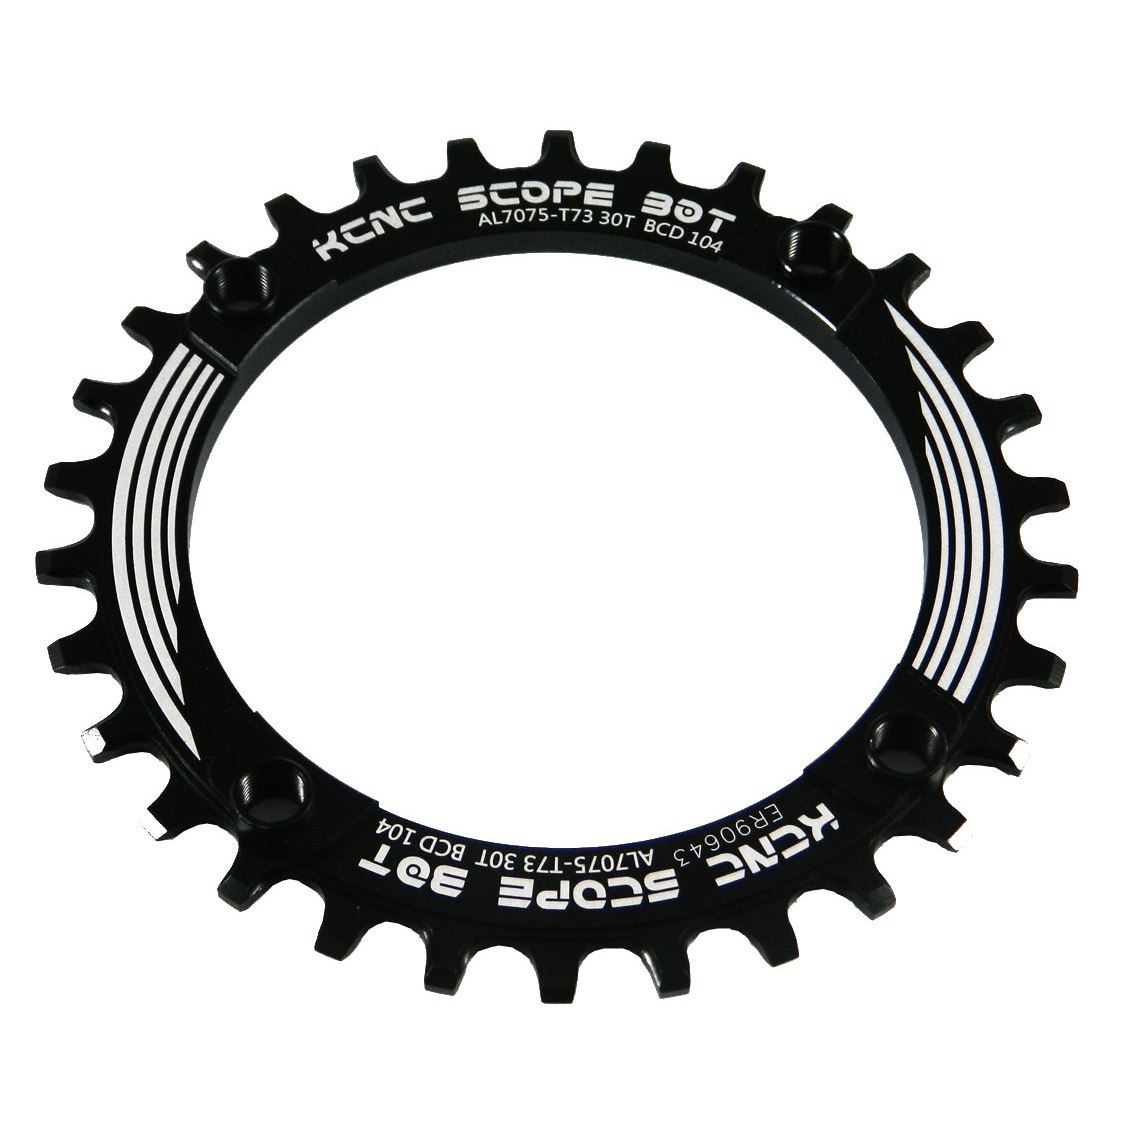 KCNC Scope MTB Chainring 104mm 1-speed Narrow-Wide - black